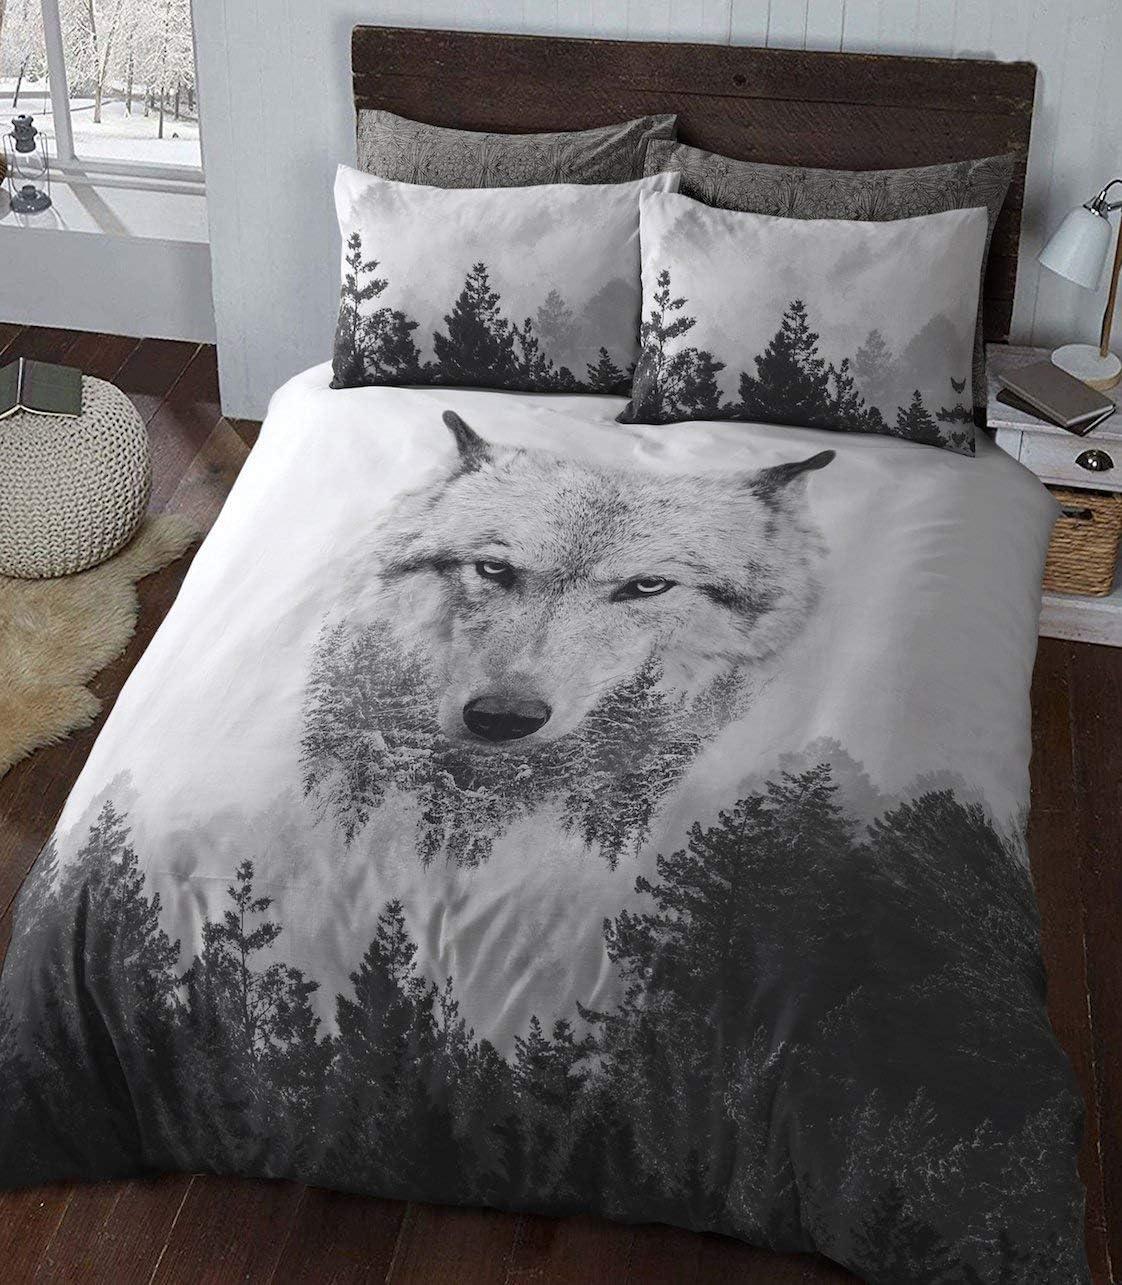 Juego de Cama Doble Sleep Down, algodón, Panel de Lobo